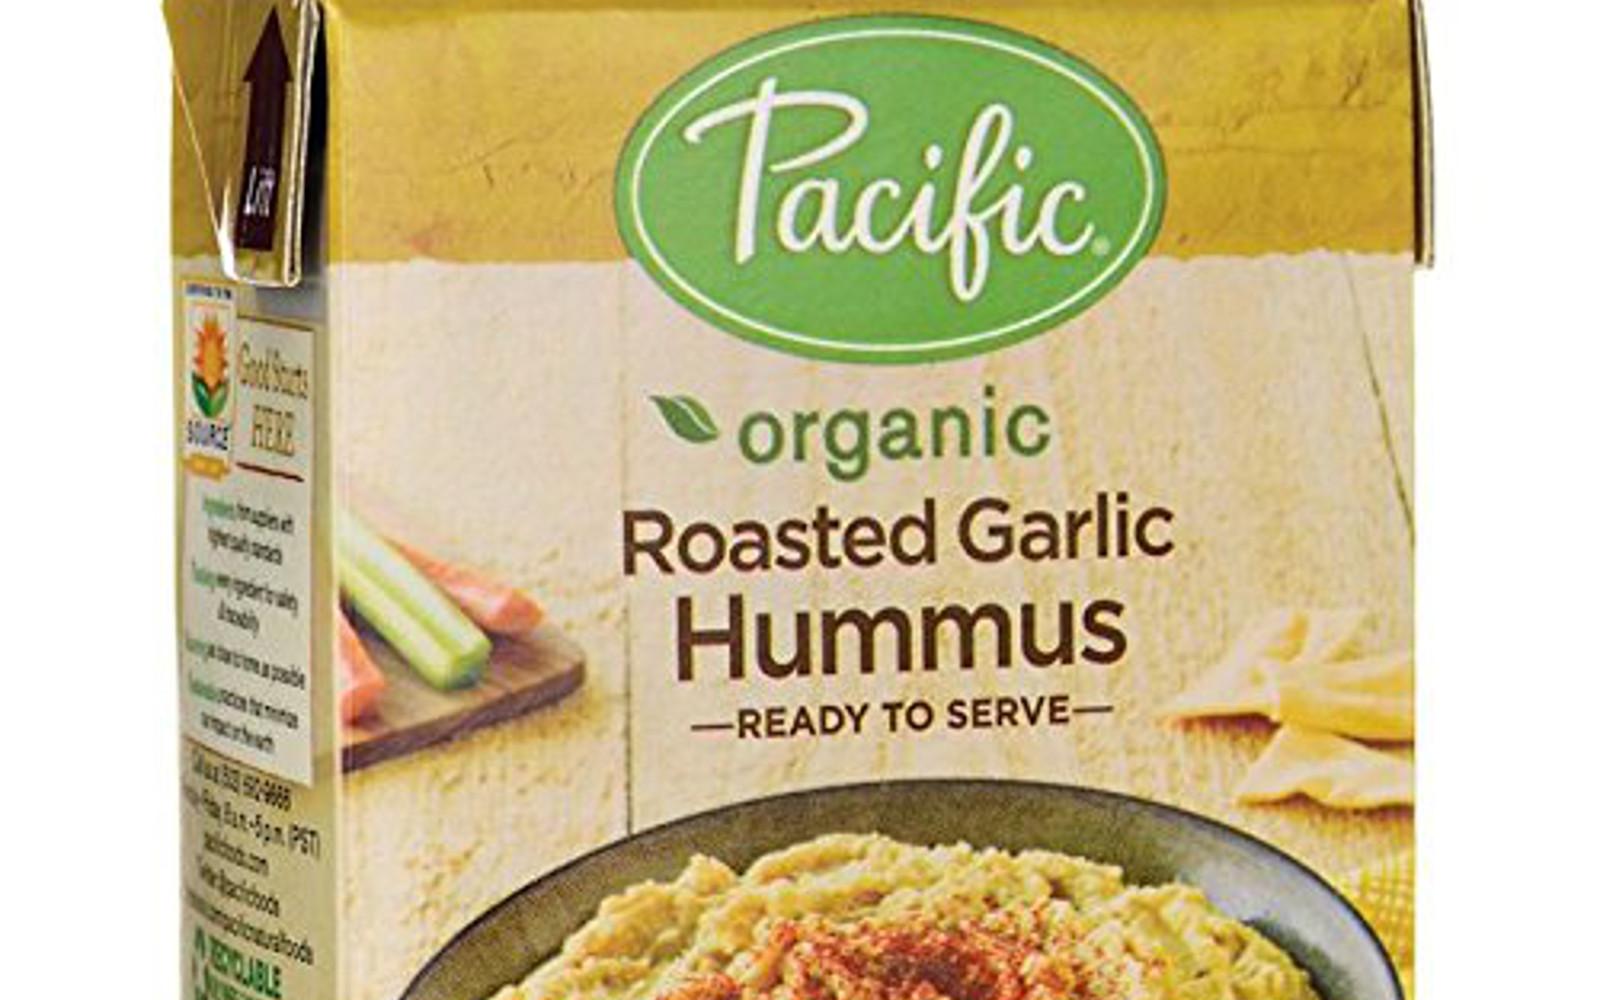 Pacific Hummus